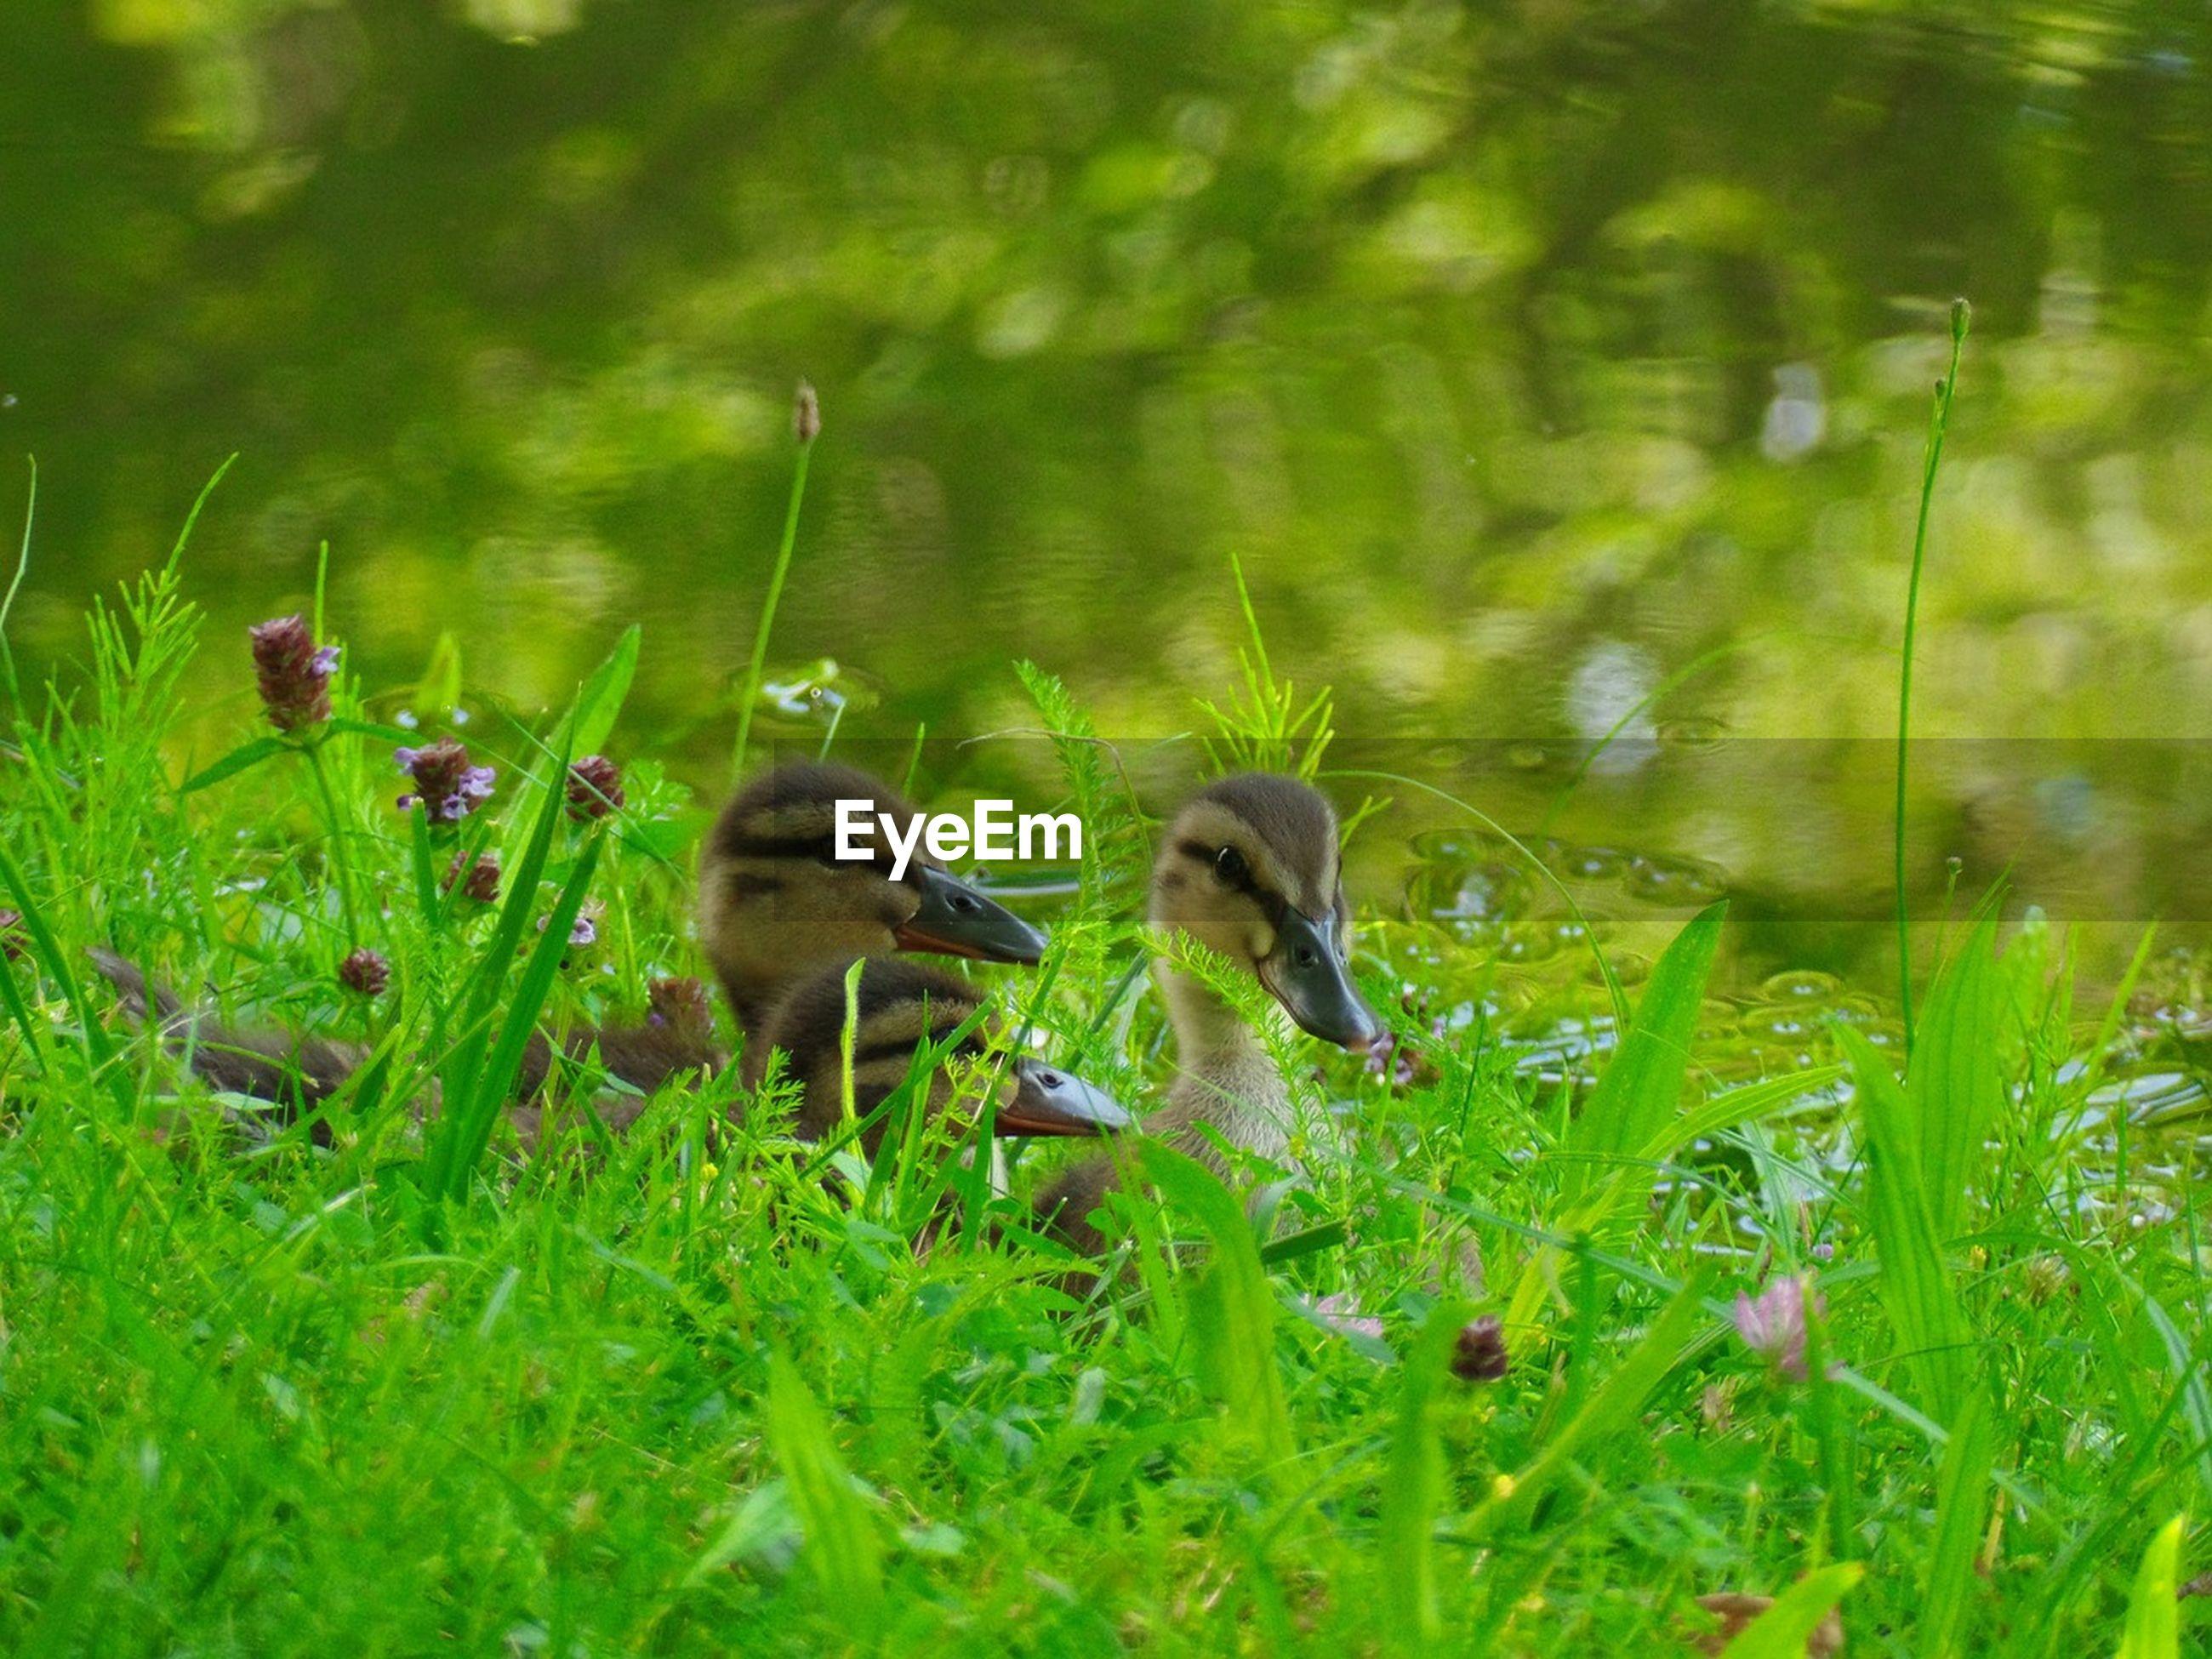 Ducklings on grassy field by lake